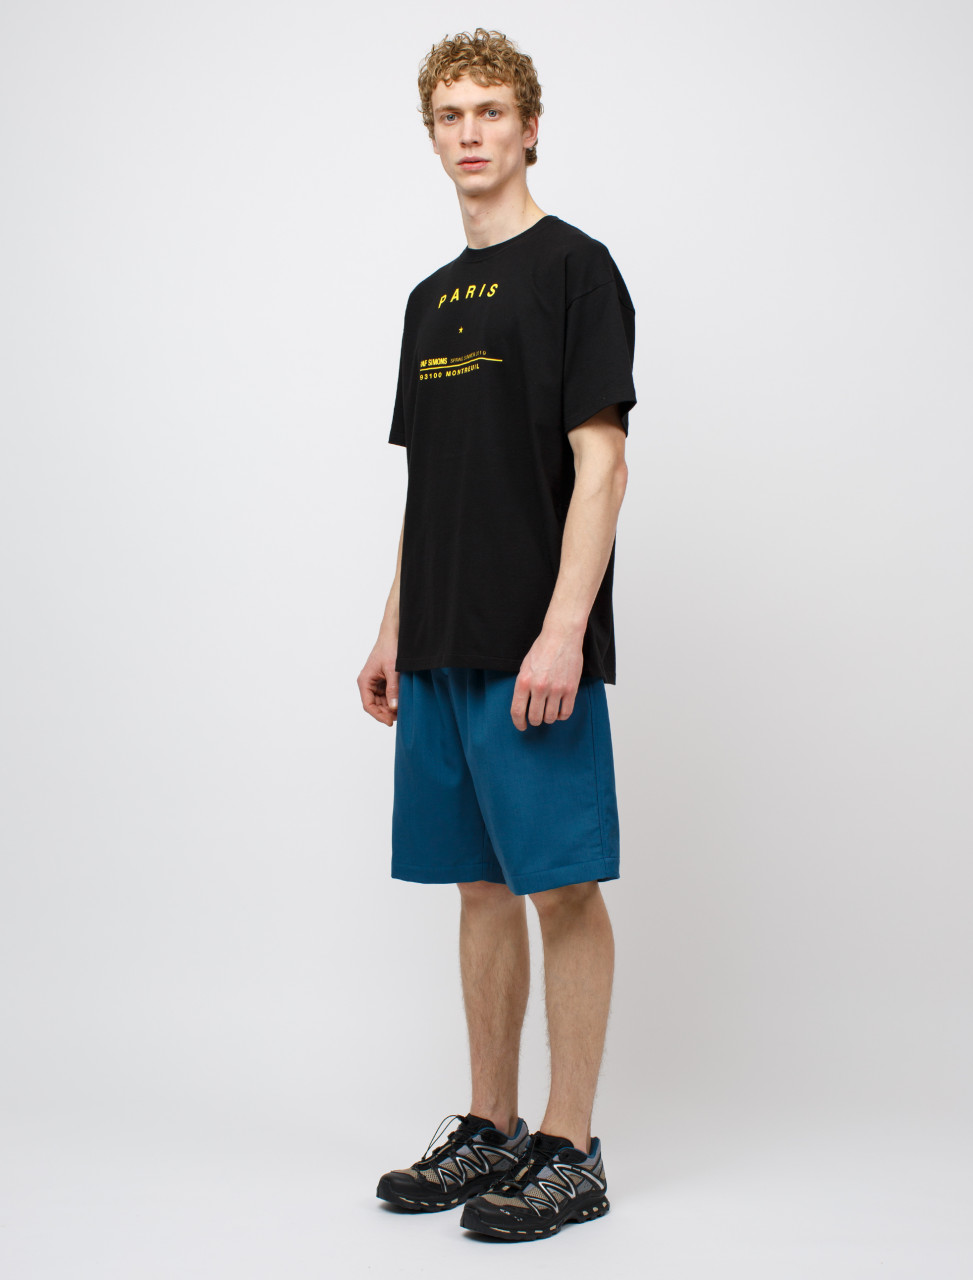 Shorts in Petrol